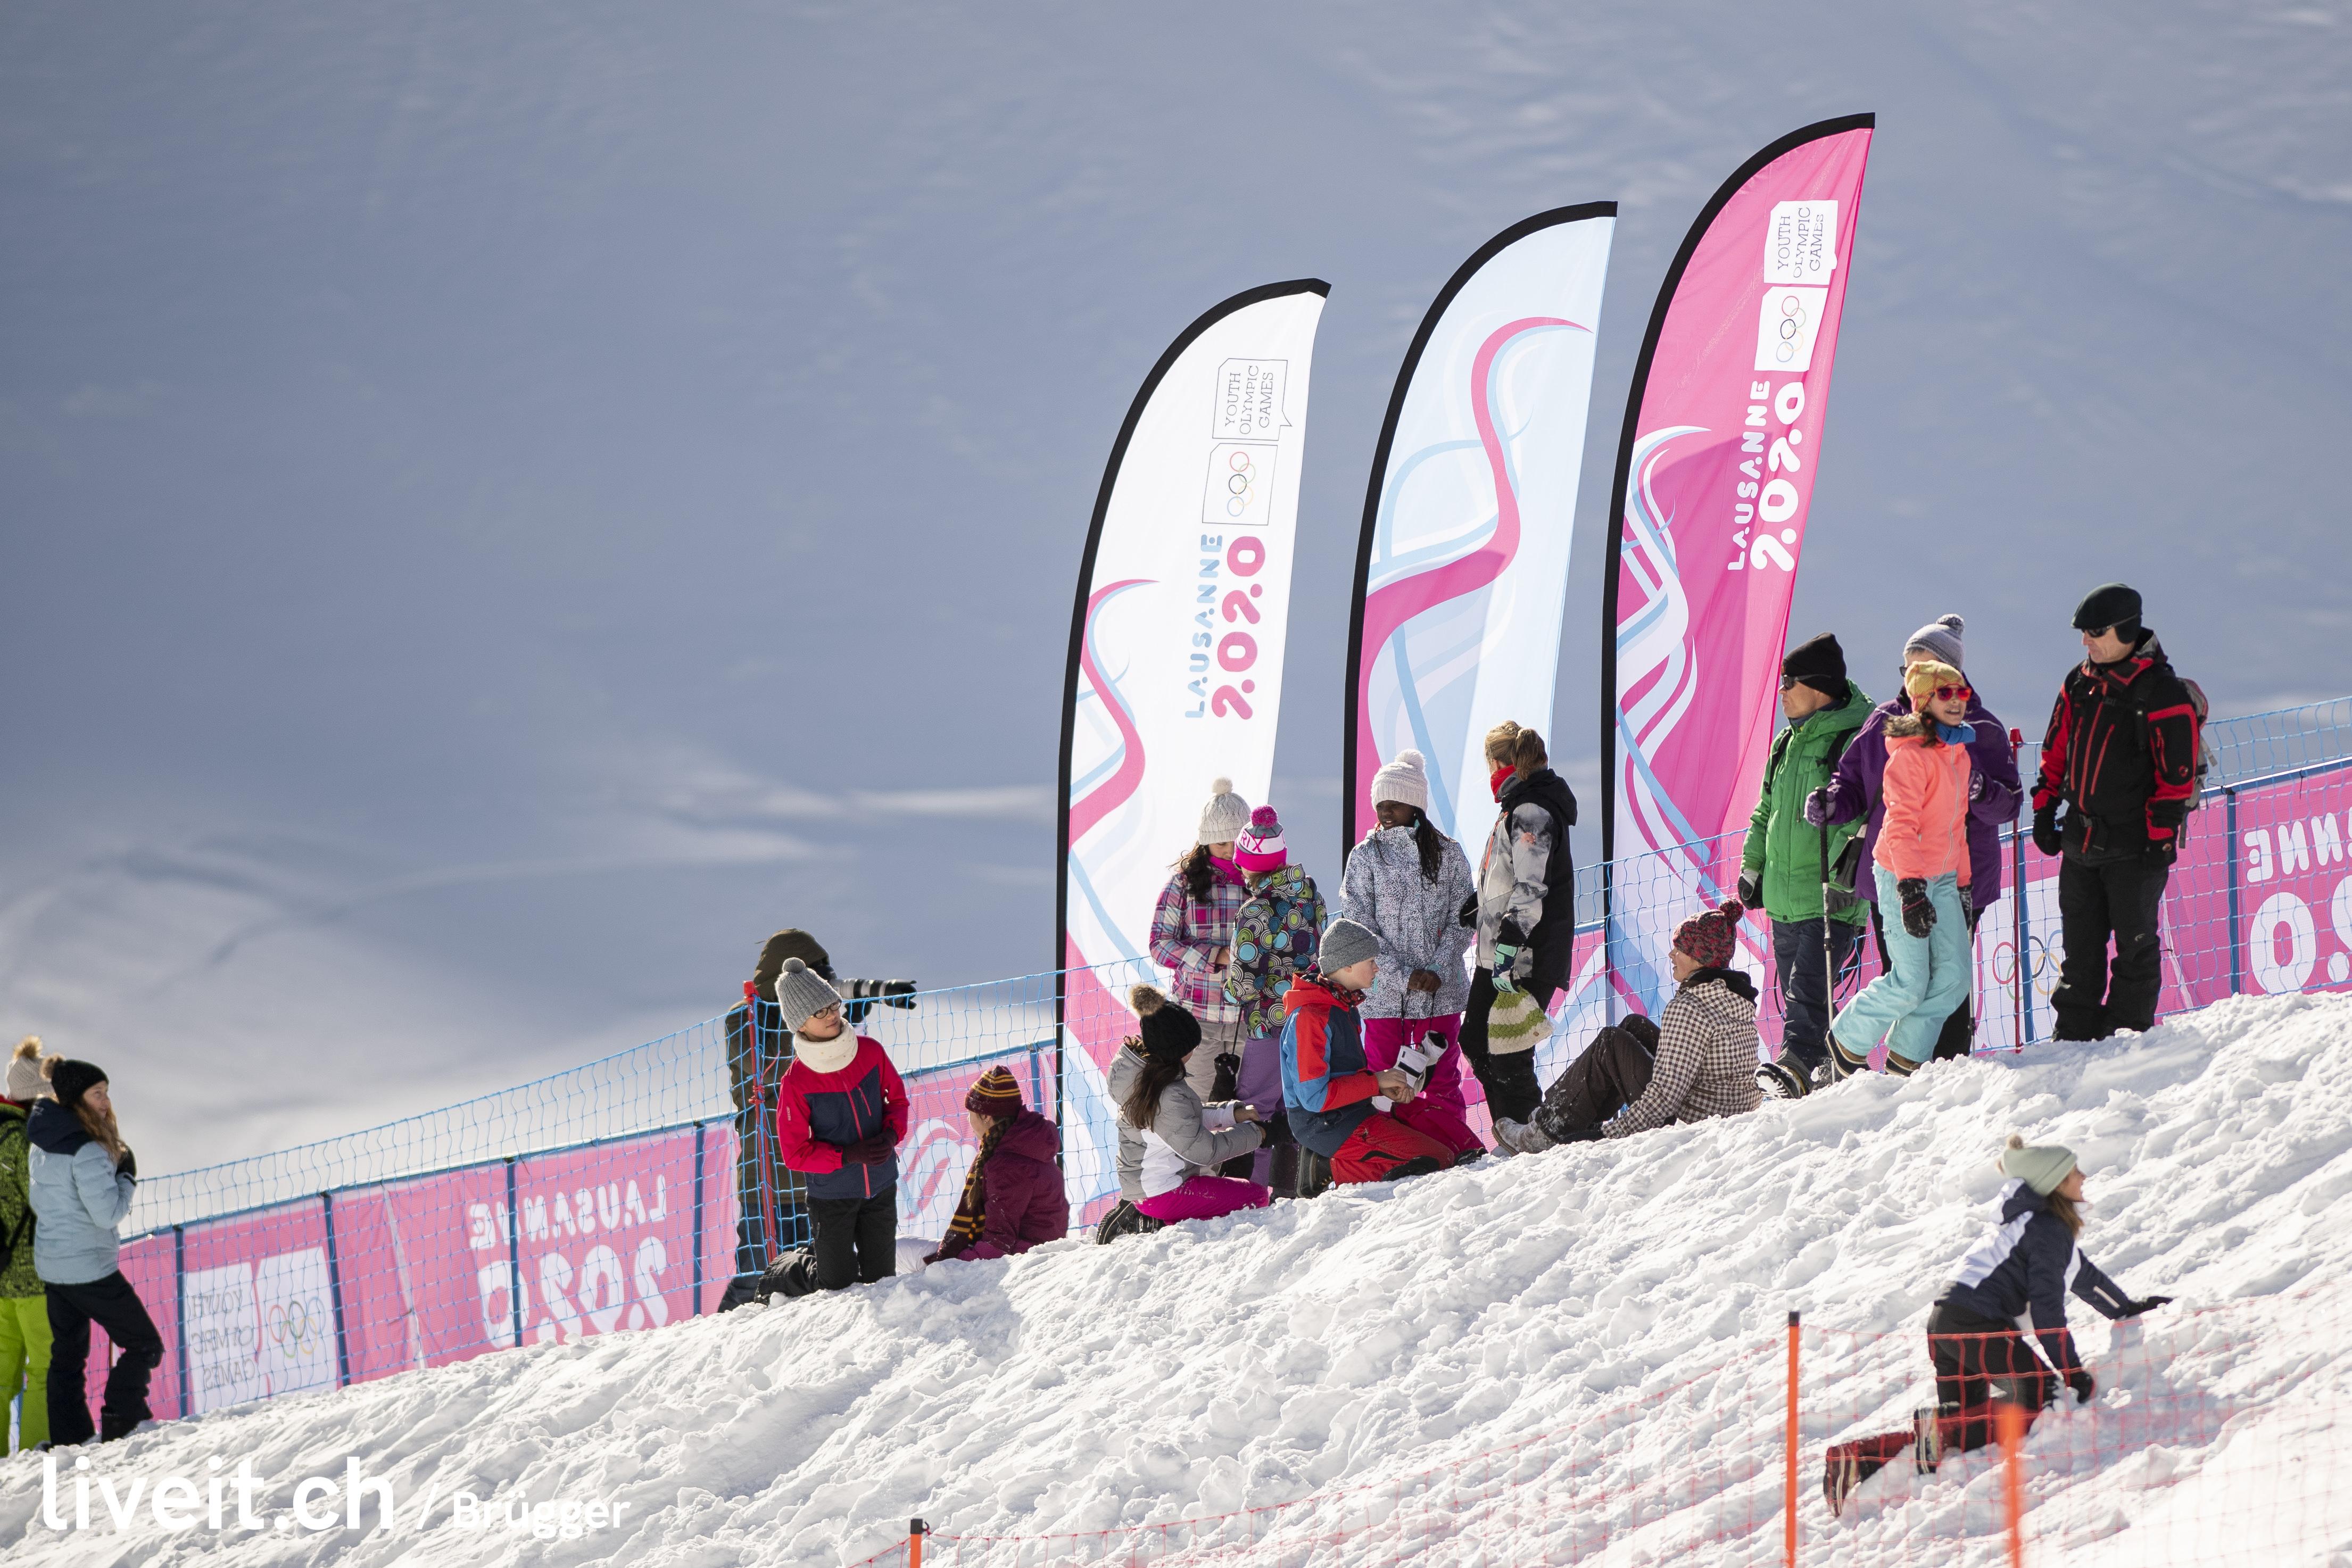 SWITZERLAND LAUSANNE YOG LAUSANNE2020 FREESKI SNOWBOARD HALFPIPE SLOPESTYLE